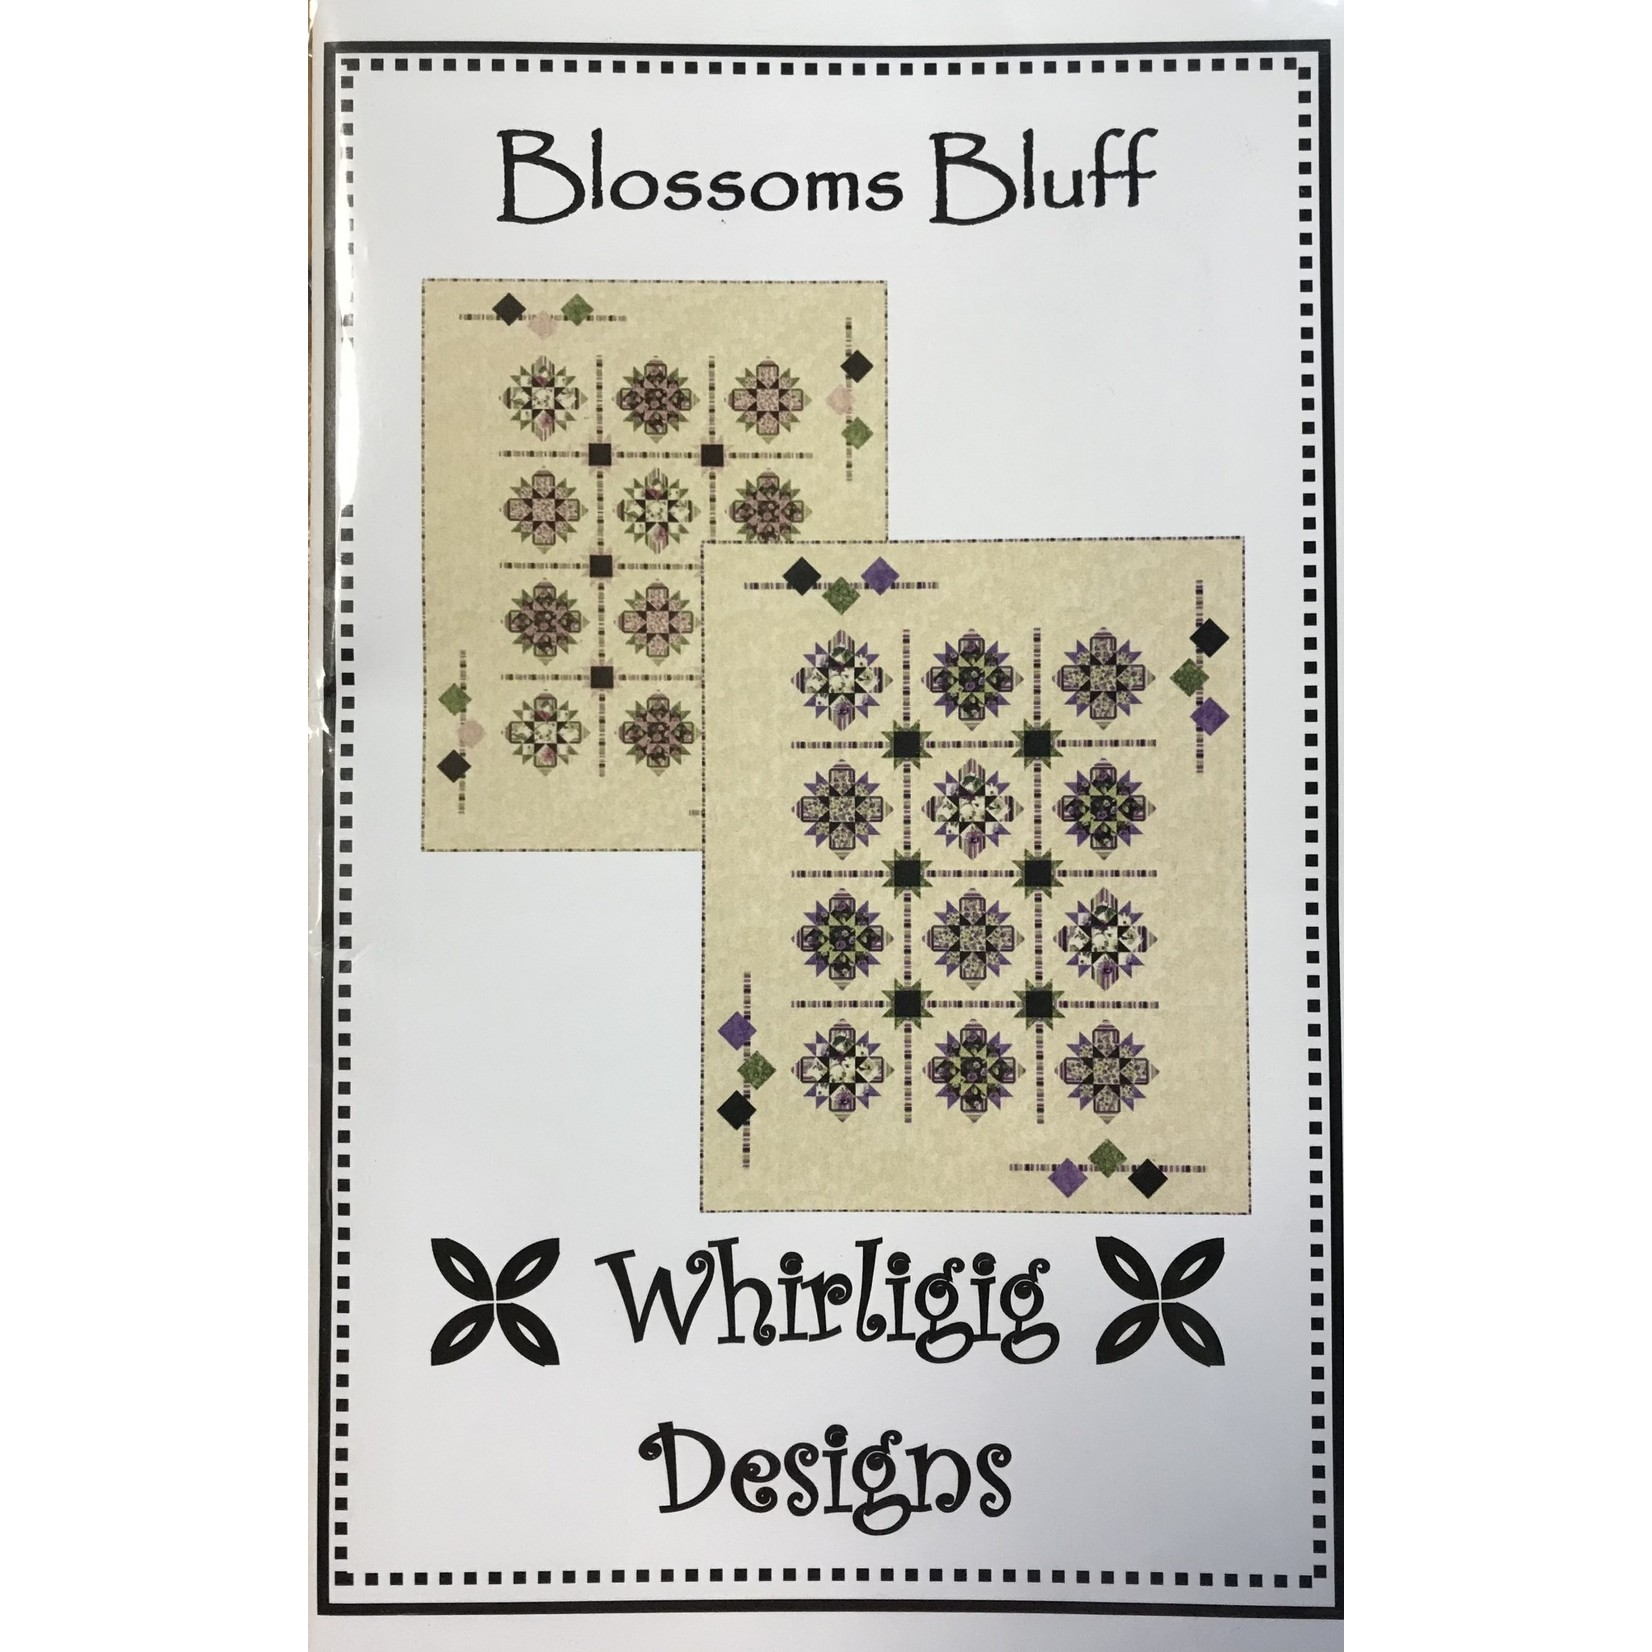 Whirligig Designs BLOSSOM BLUFF PATTERN